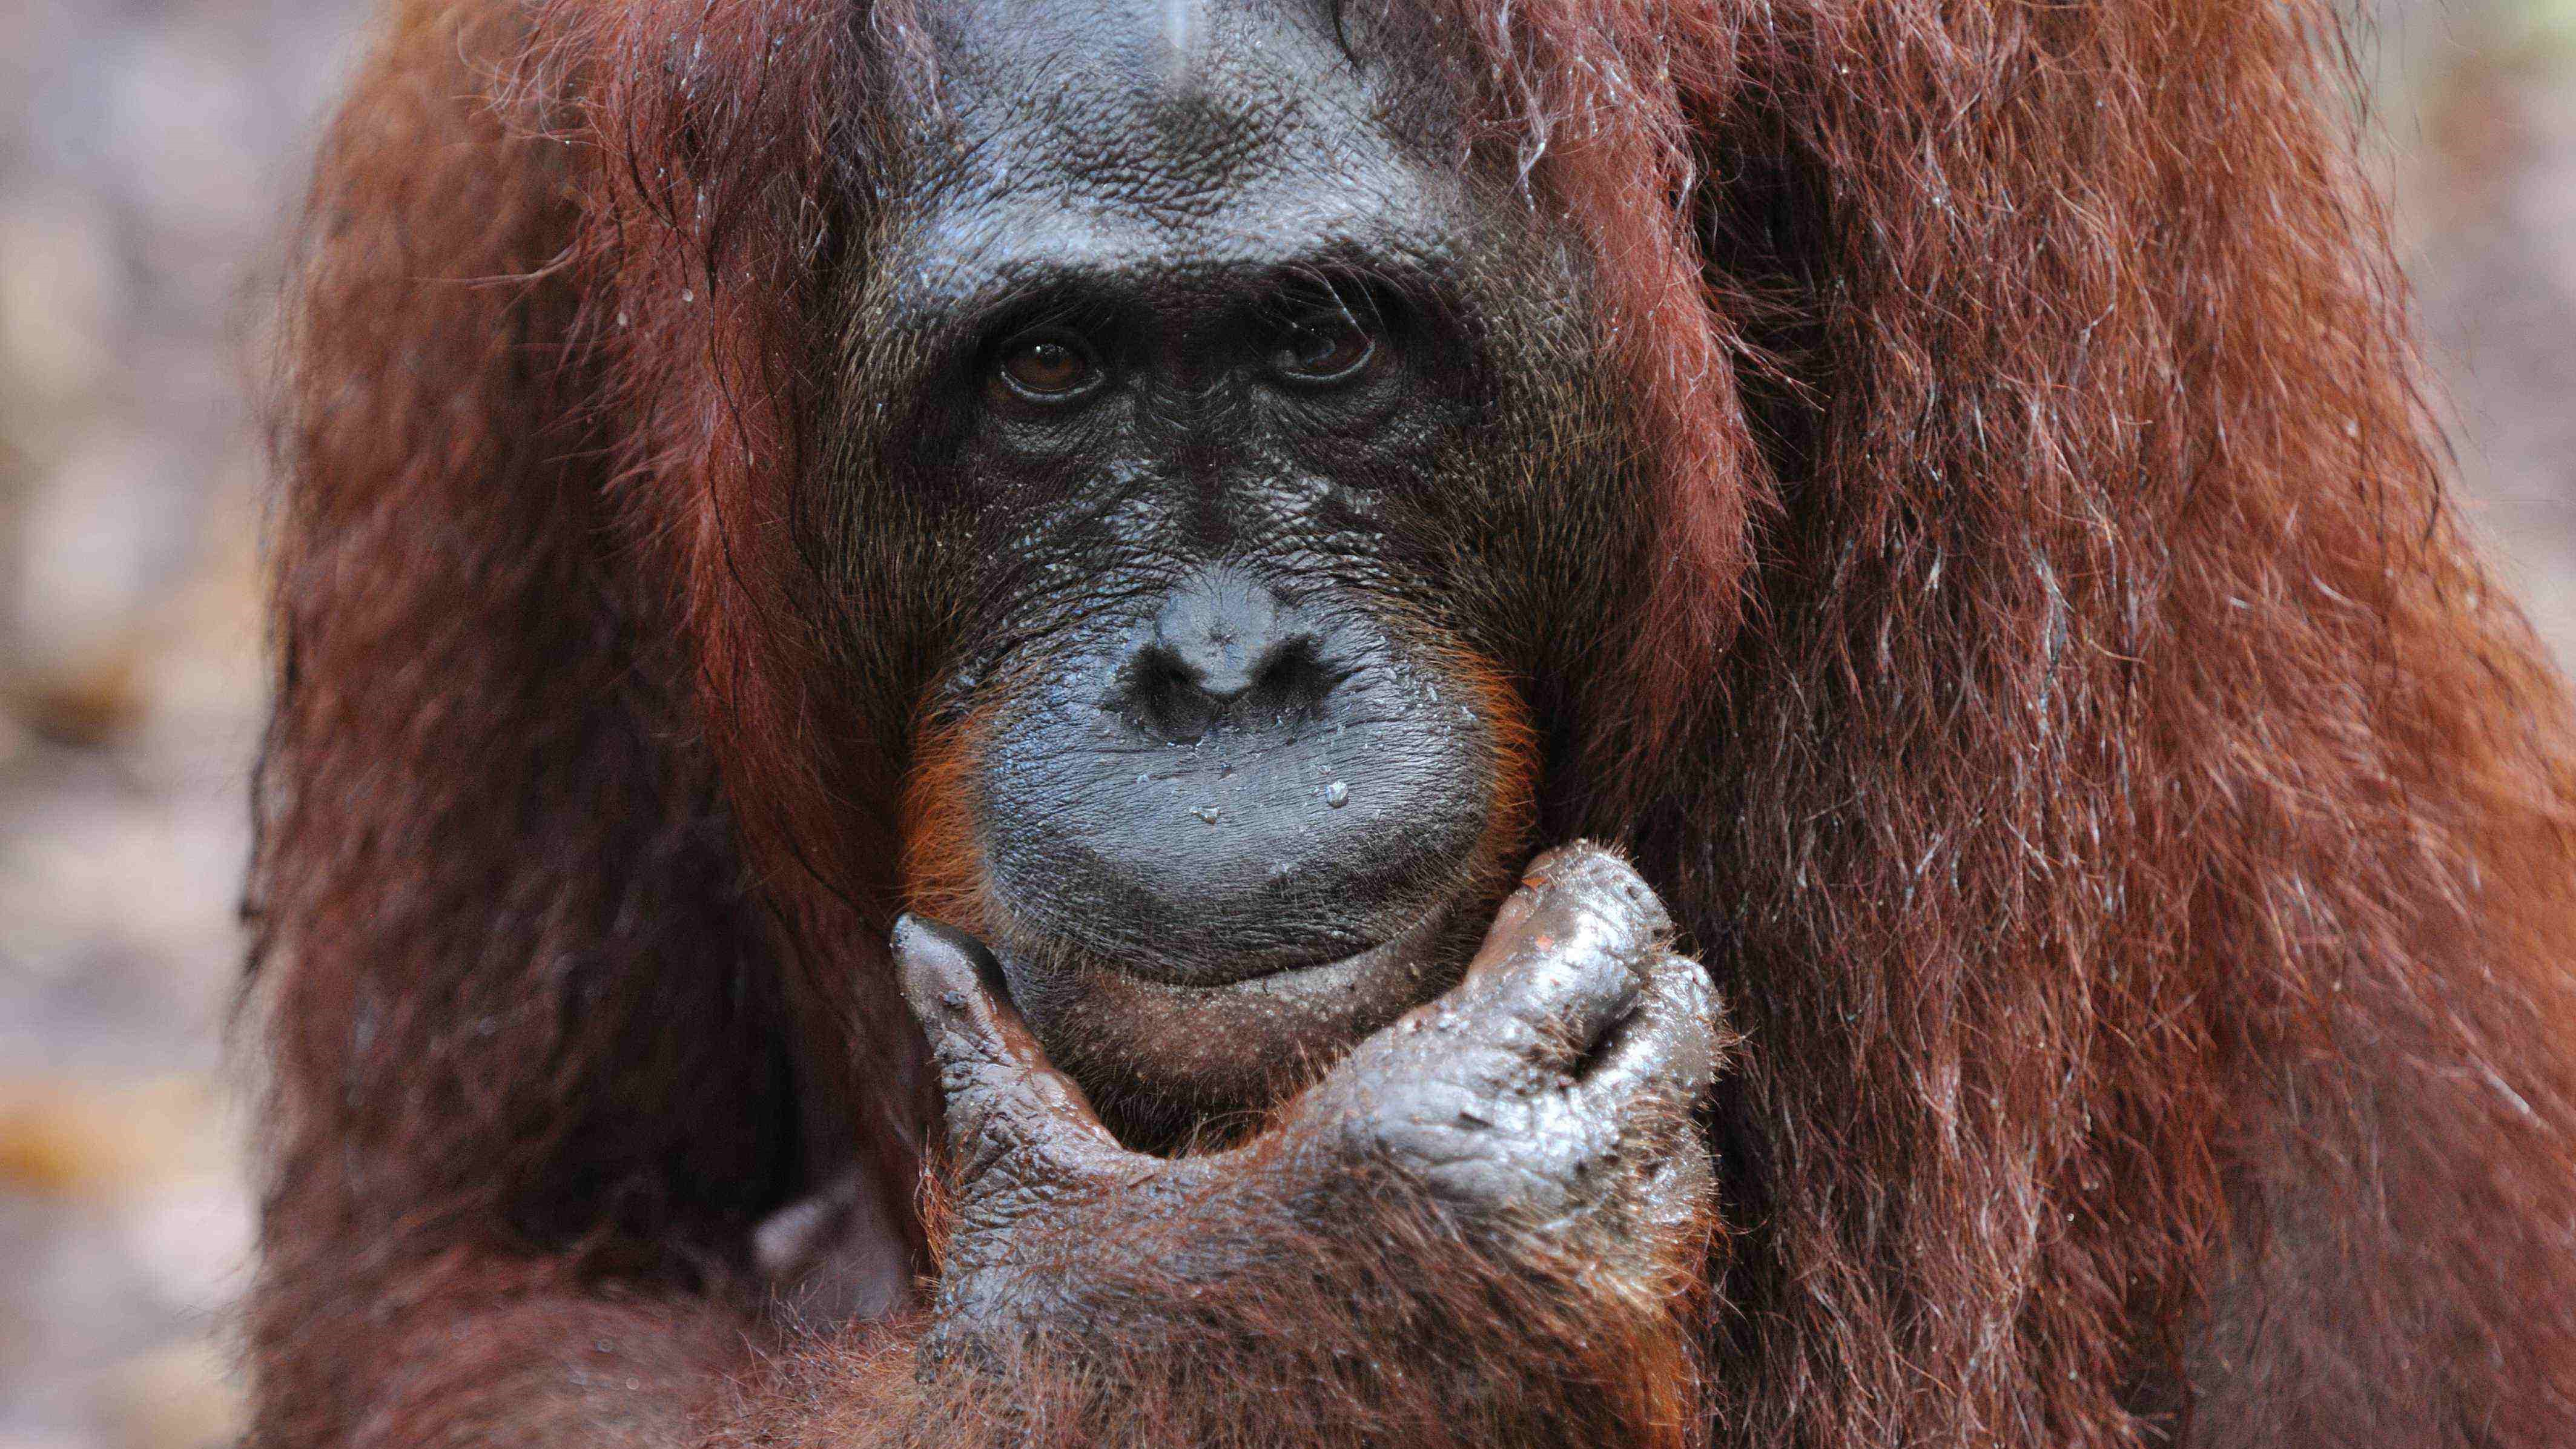 kutai park, orangutan, wildlife safari, tour, trip guide, jungle cruise